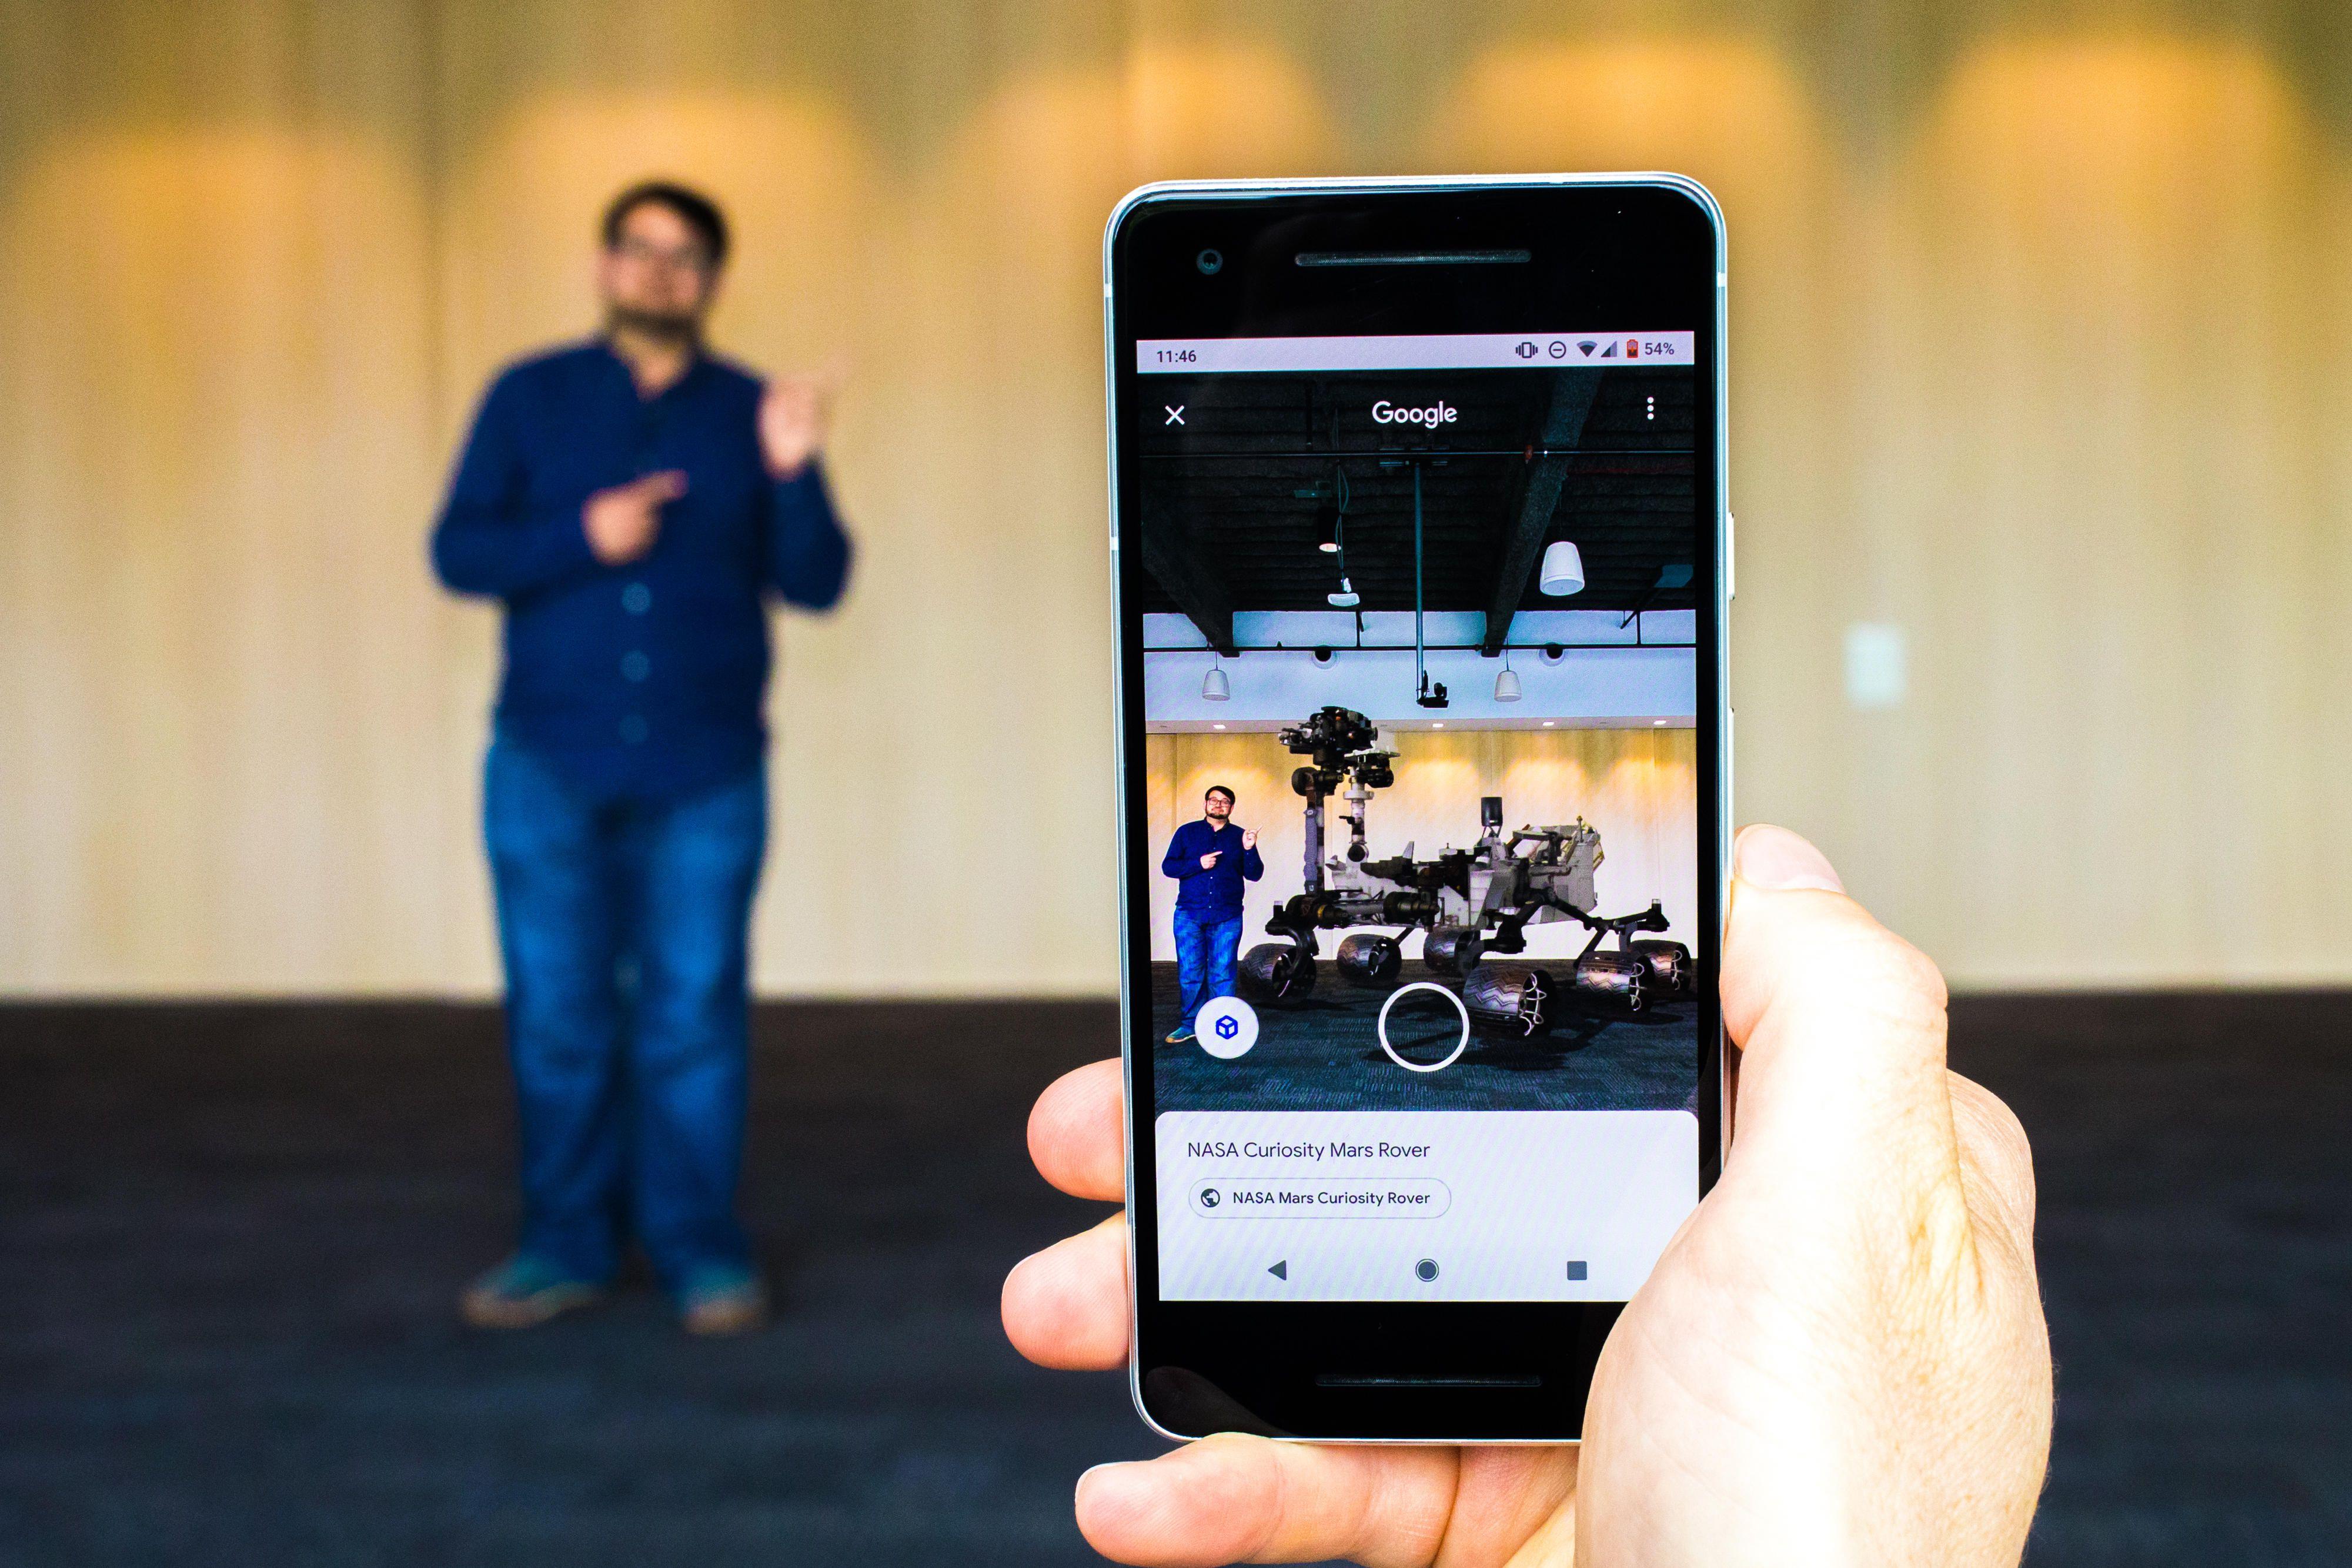 google-io-2019-ar-augmented-reality-0490